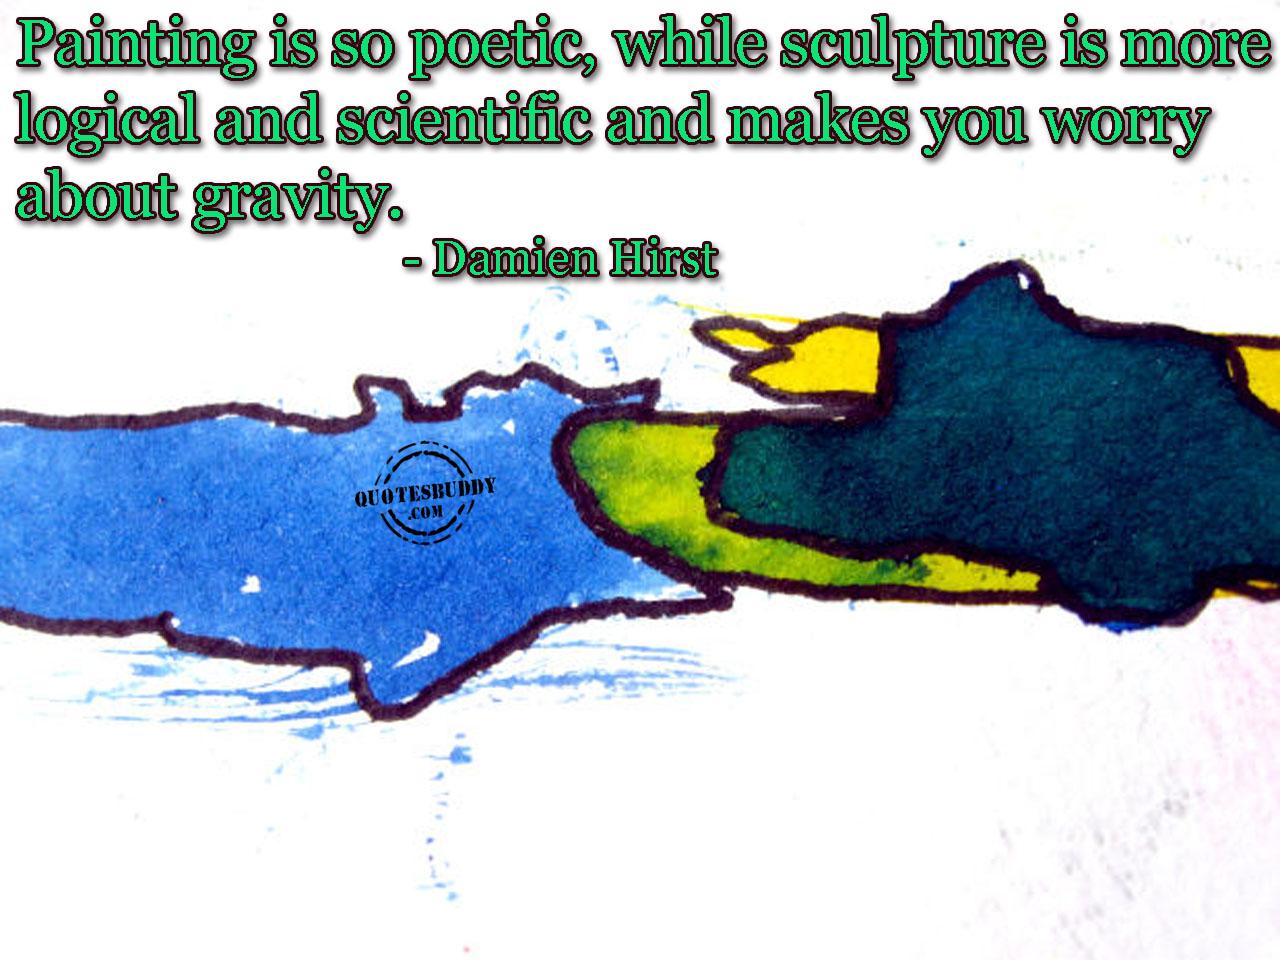 Damien Hirst's quote #3